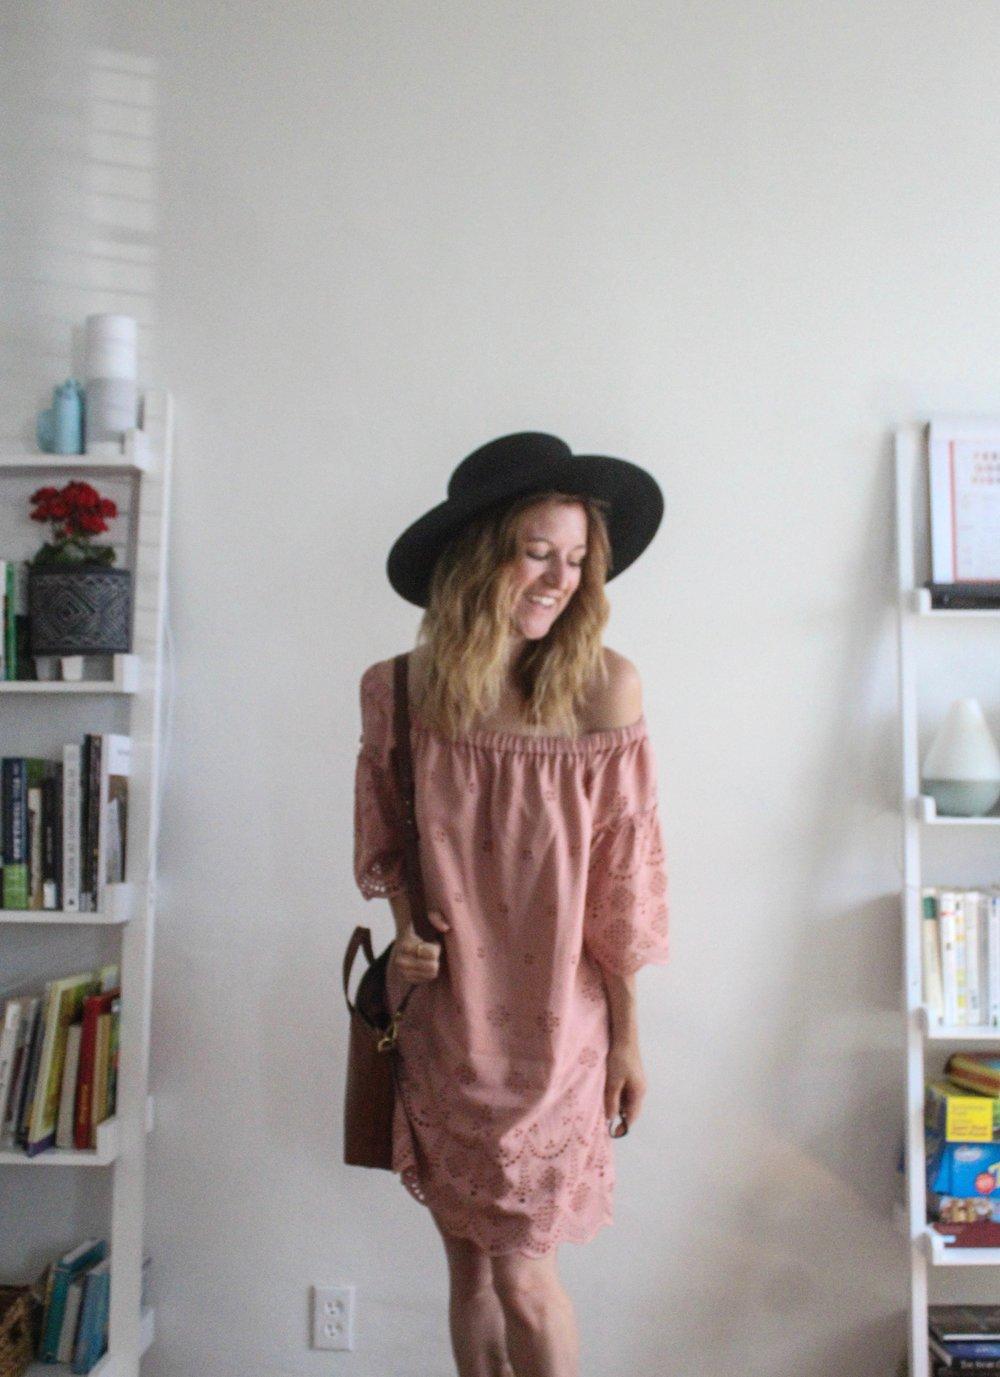 Pink-Dress-Life-By-Bri.jpg